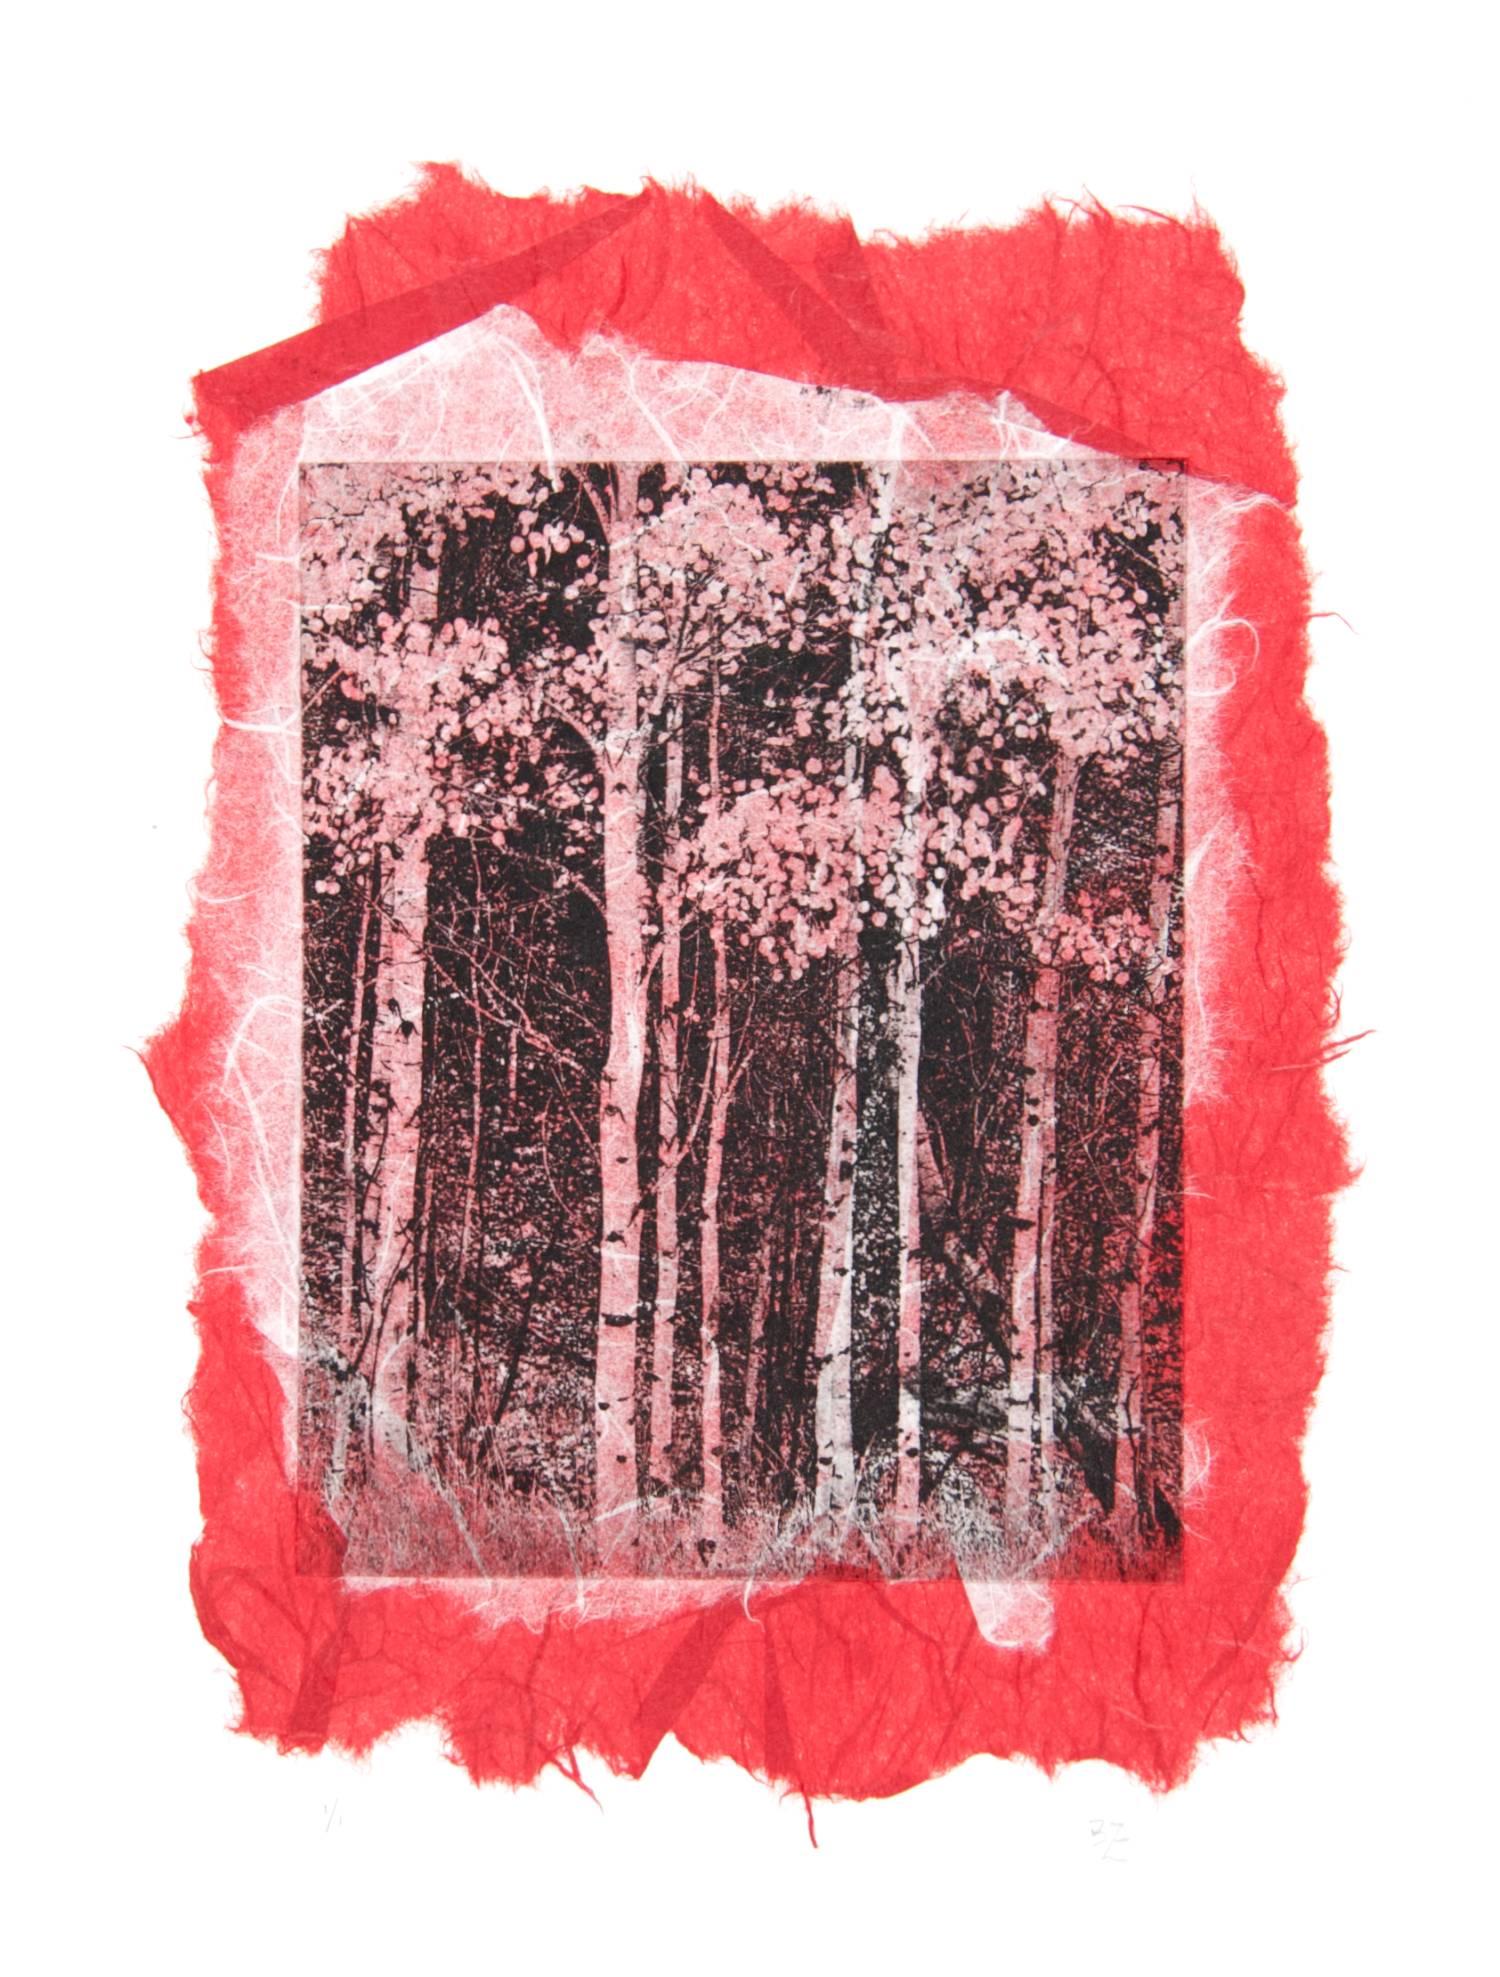 Aspen chine-collé (red/white)